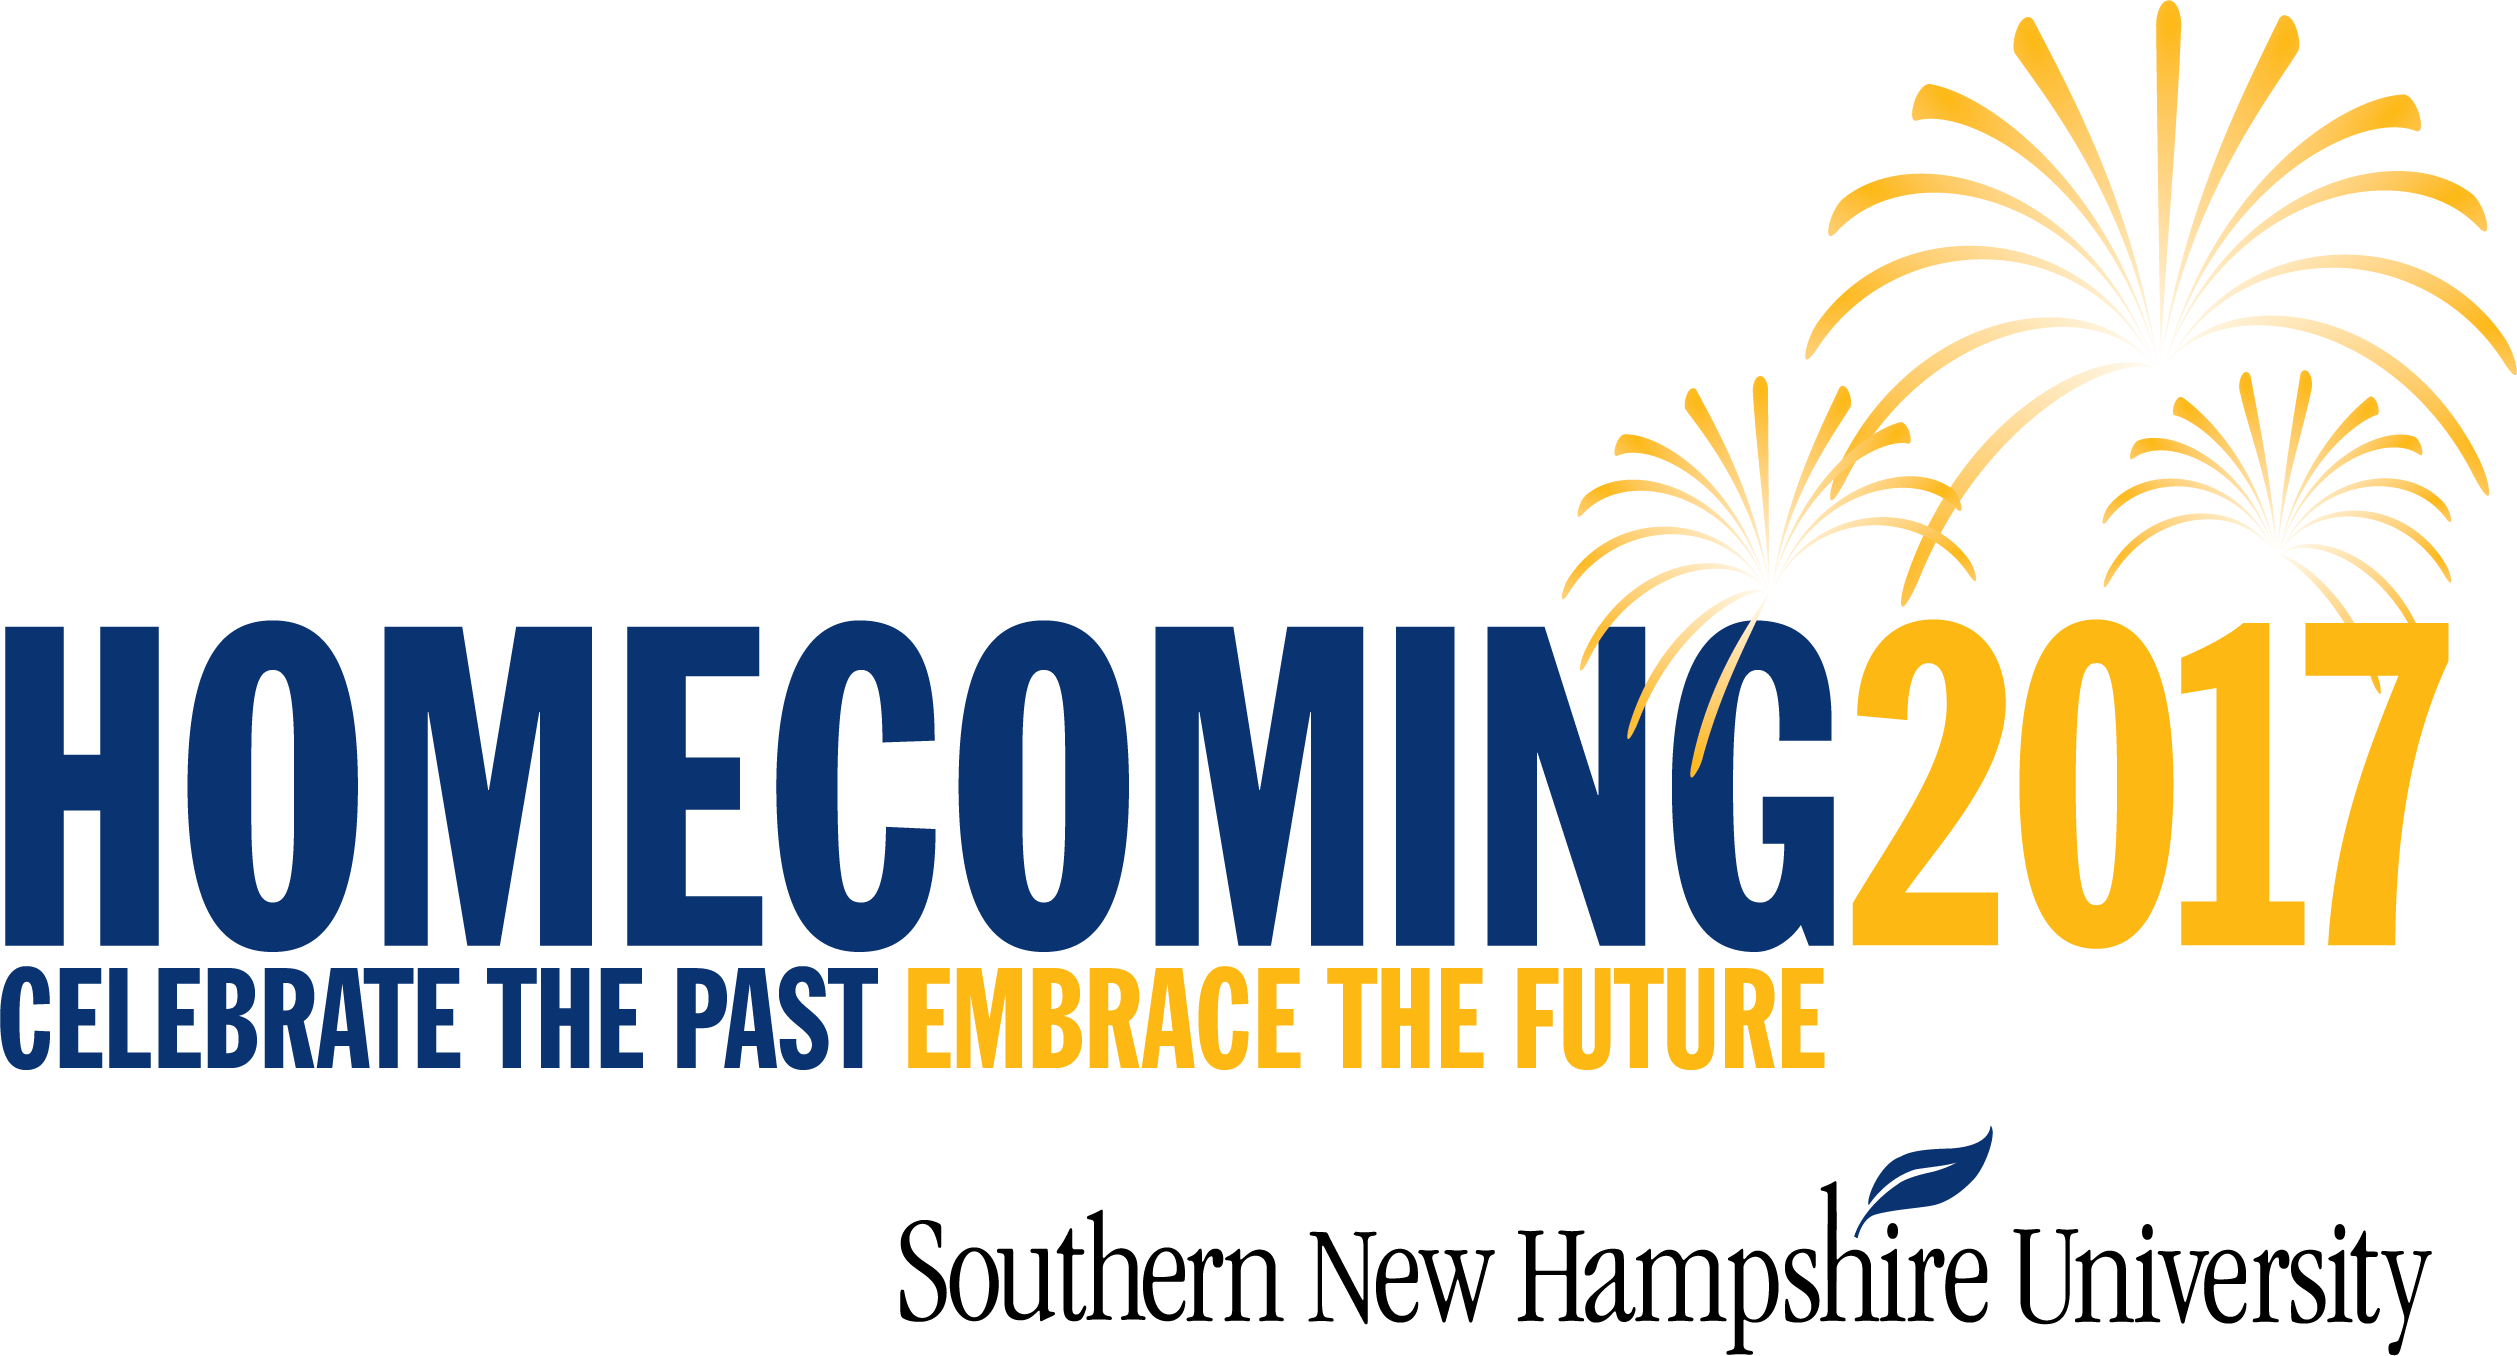 HomecomingLogo2017png